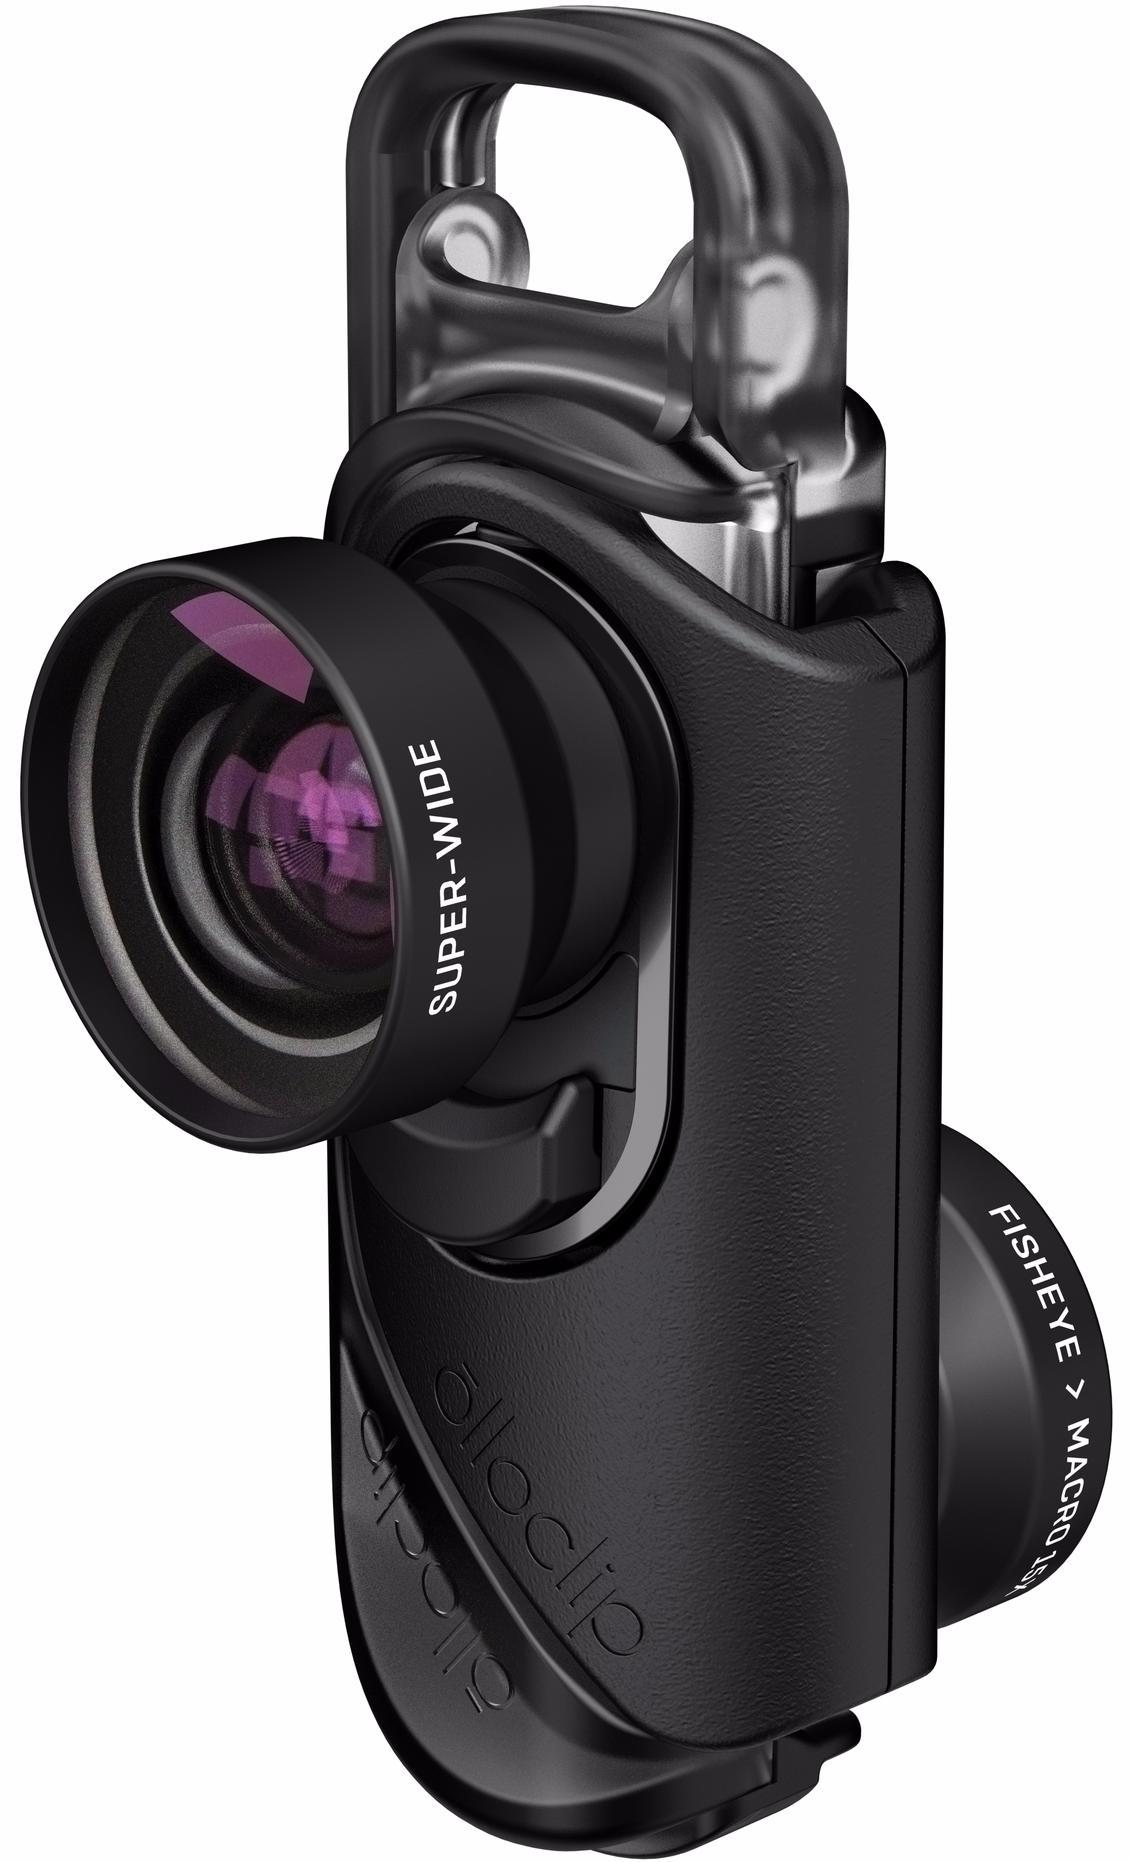 Core объектив olloclip 4 in 1 lens oc 0000115 eu silver lens black clip чехол ollocase for iphone 6 plus clear dark gray